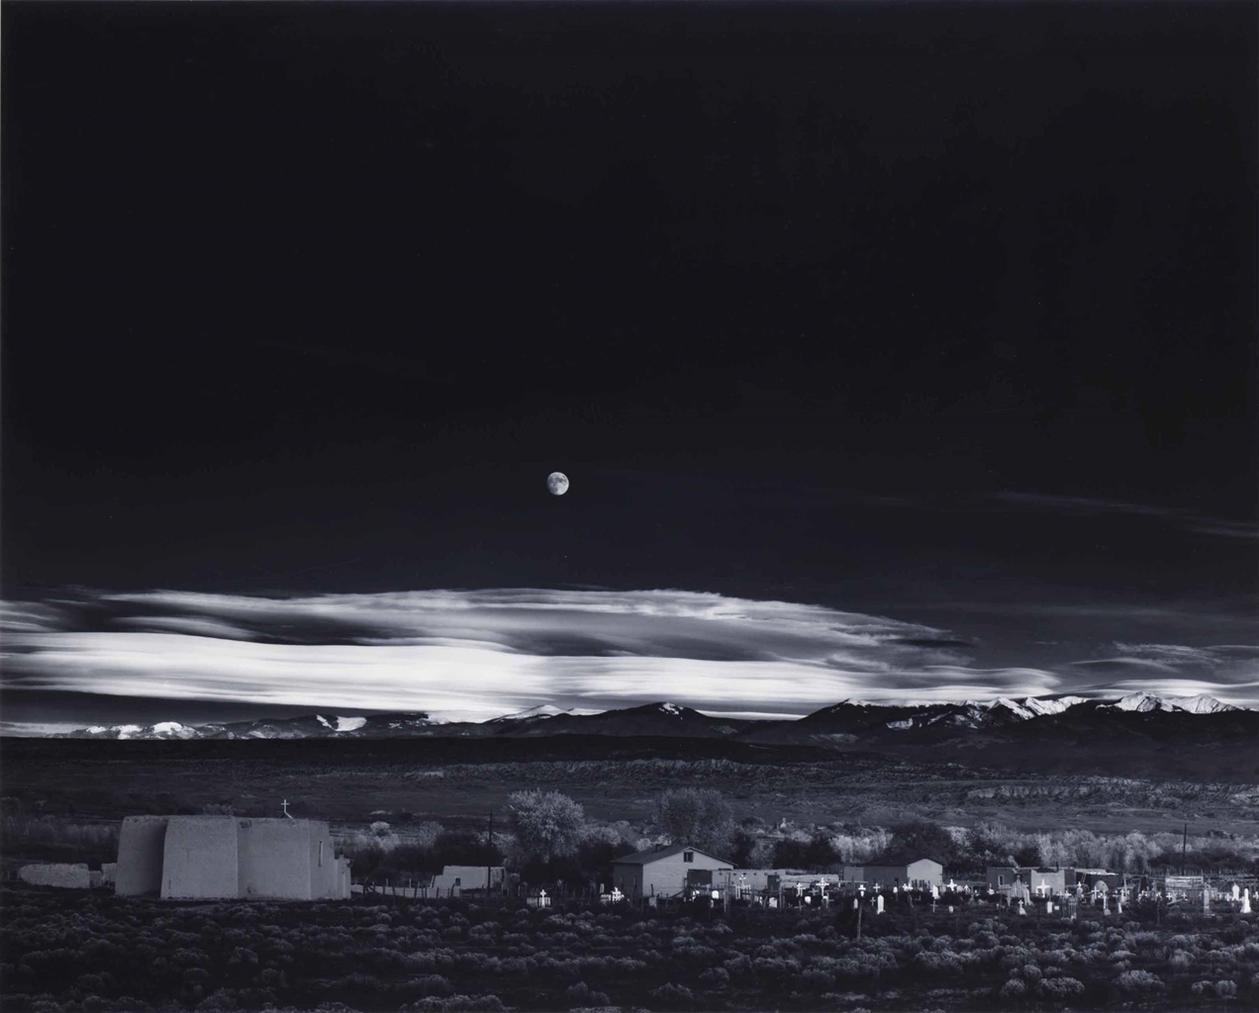 Ansel Adams-Moonrise, Hernandez, New Mexico-1941